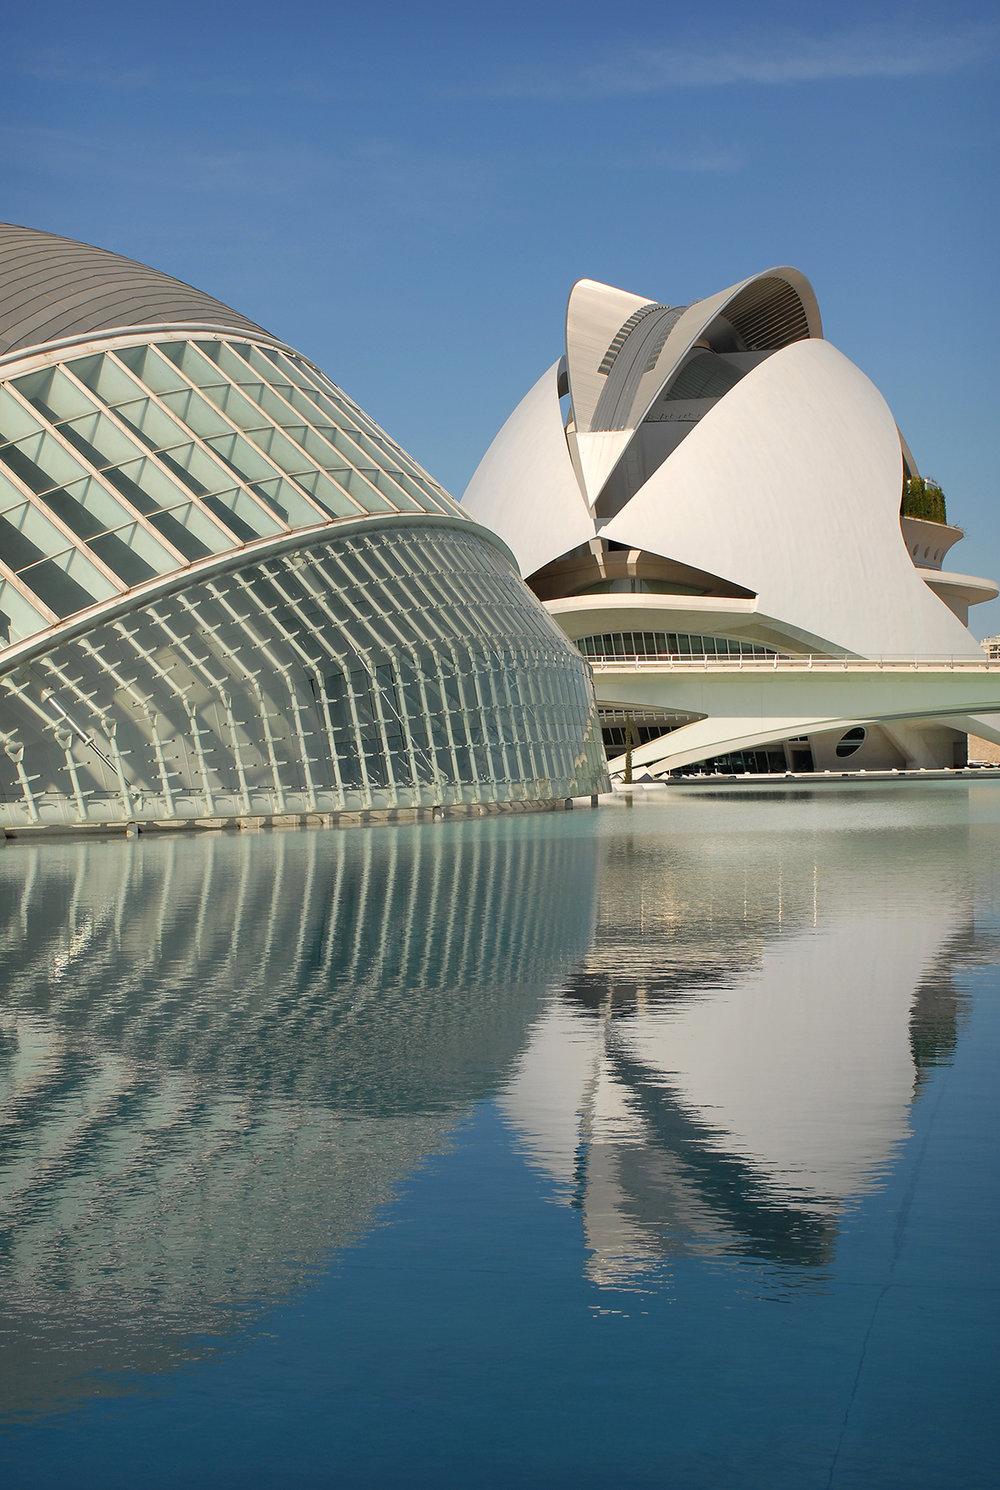 matka, matkablogi, Espanja, Valencia, matkailu, vero, kateus, matkakateus, ciudad de las artes y ciencias